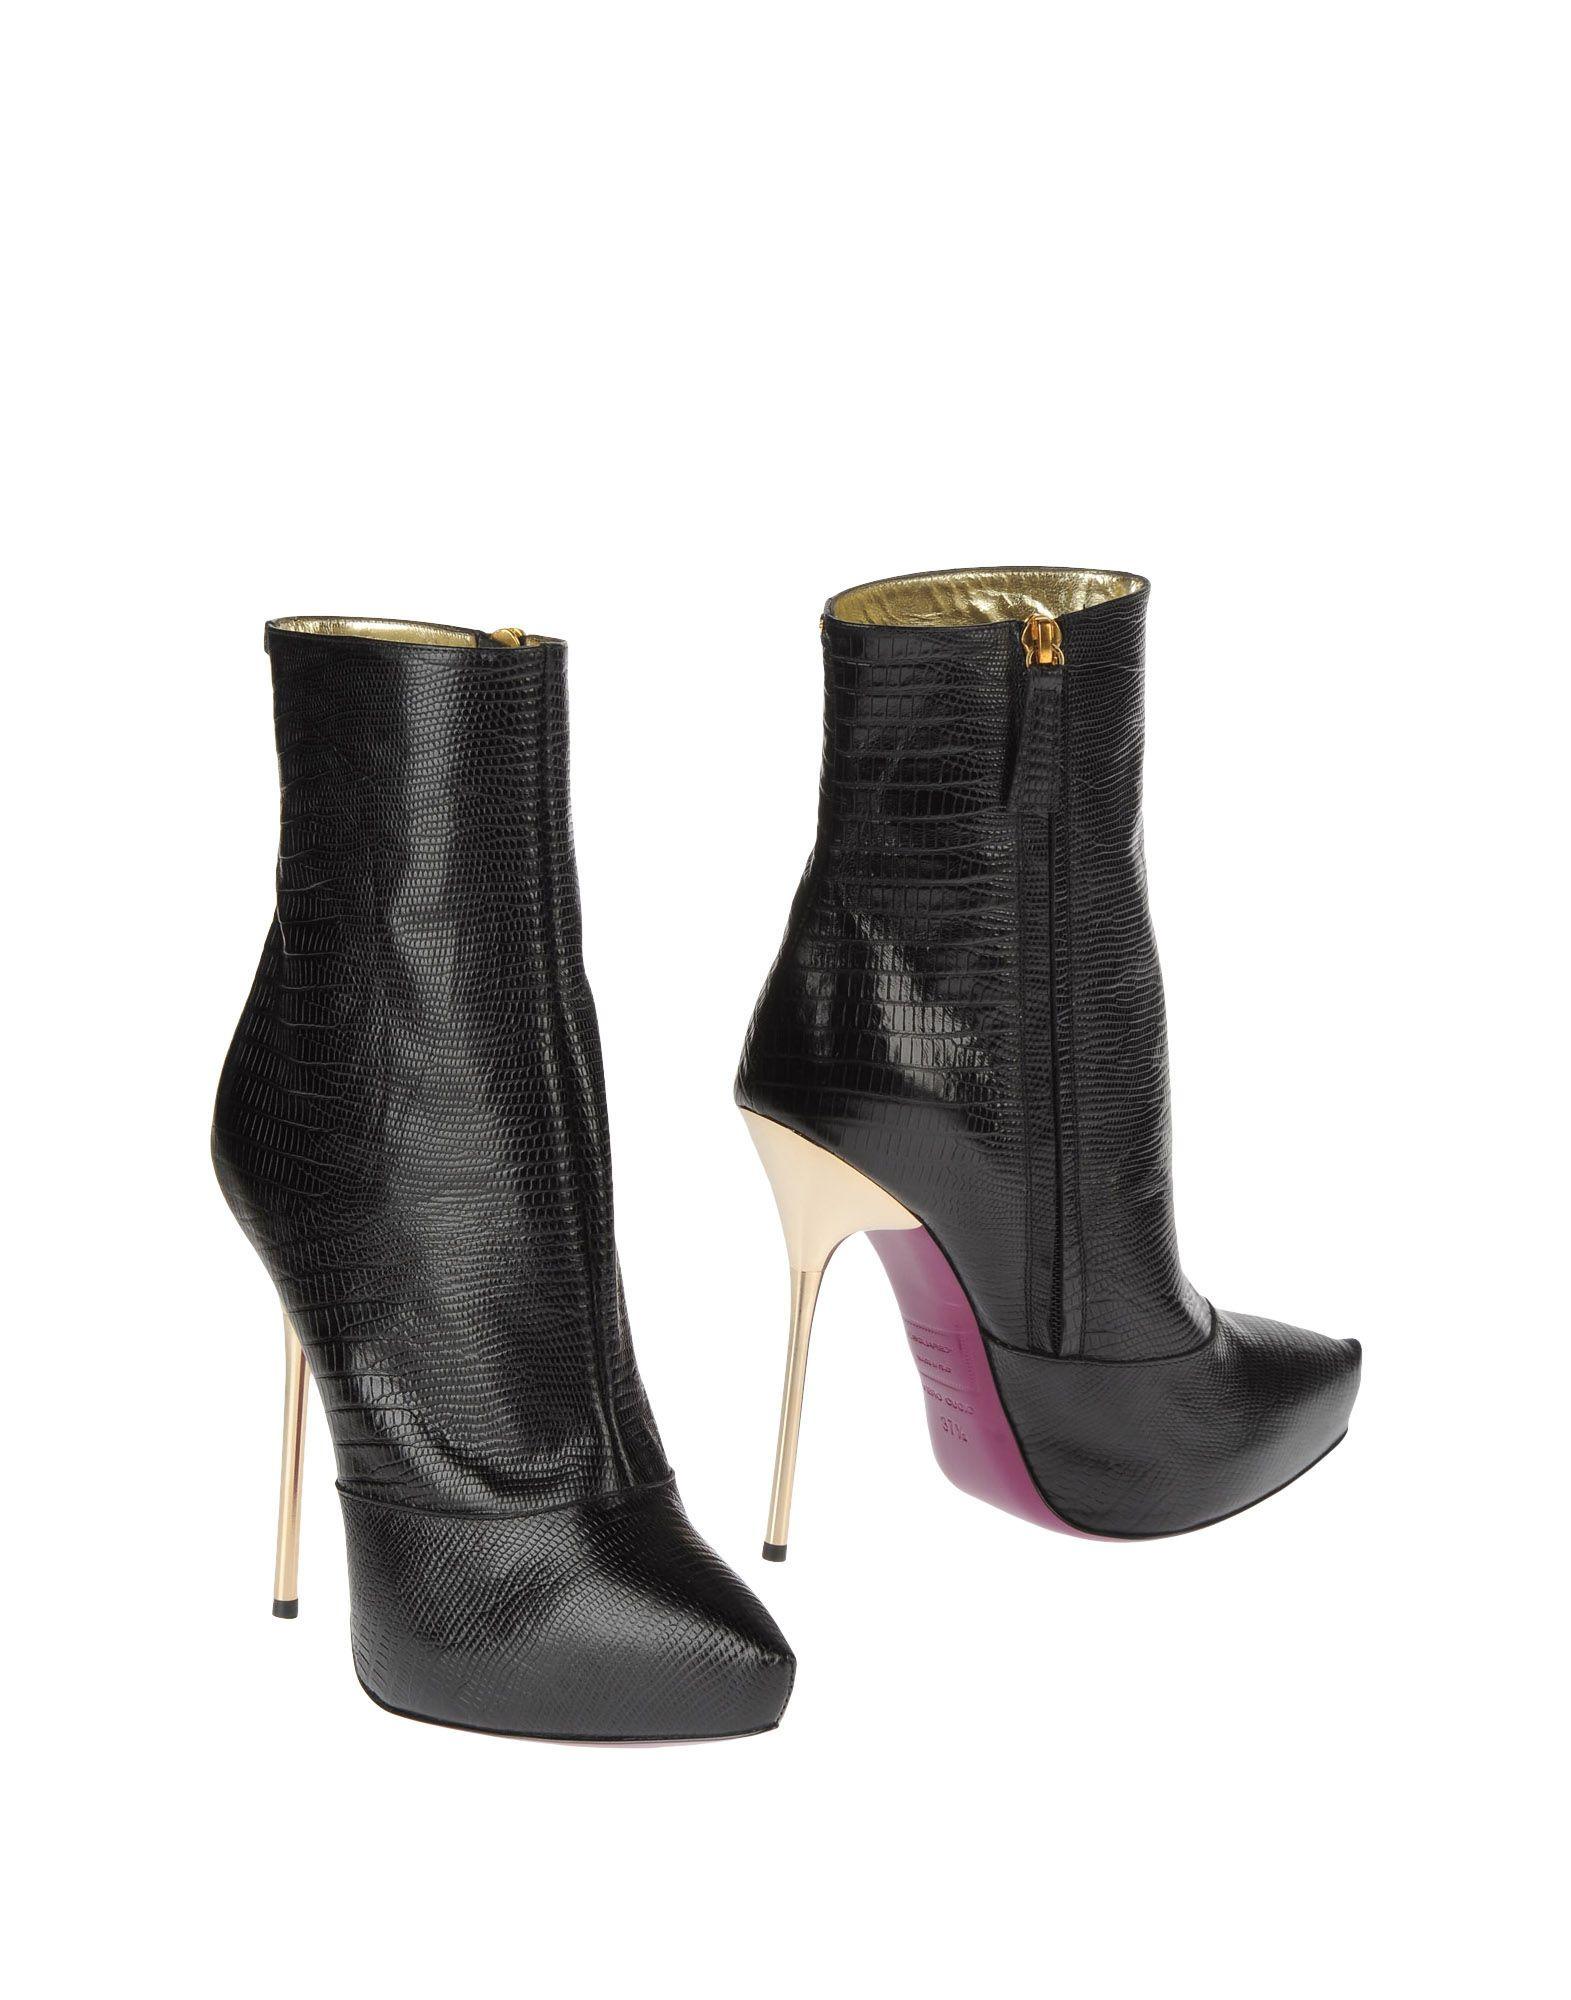 DSQUARED2 - SHOES - Ankle boots sur DSQUARED2.COM Dsquared2 Cheap Sale Hot Sale For Sale Cheap Price Outlet Cheap For Sale Online fpJm1Lx